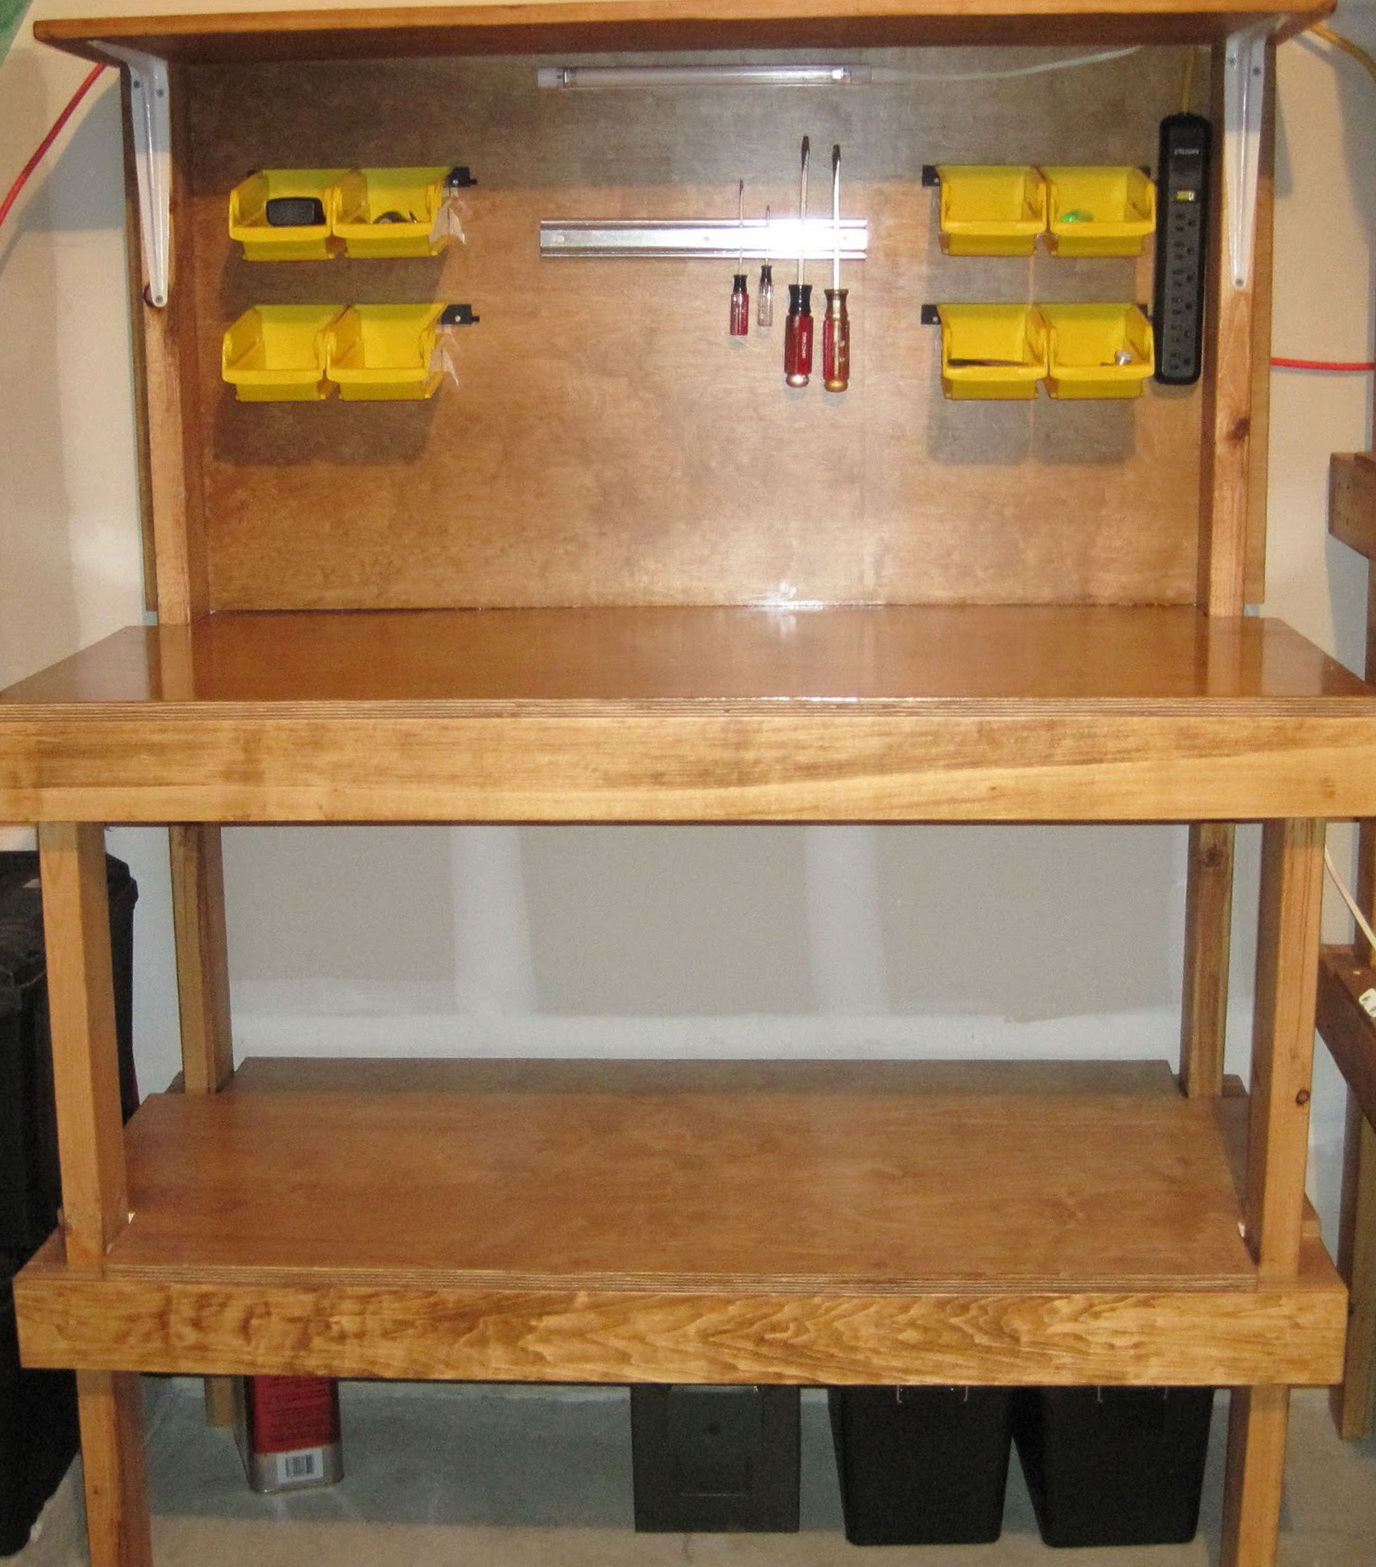 Nrma Reloading Bench Plans